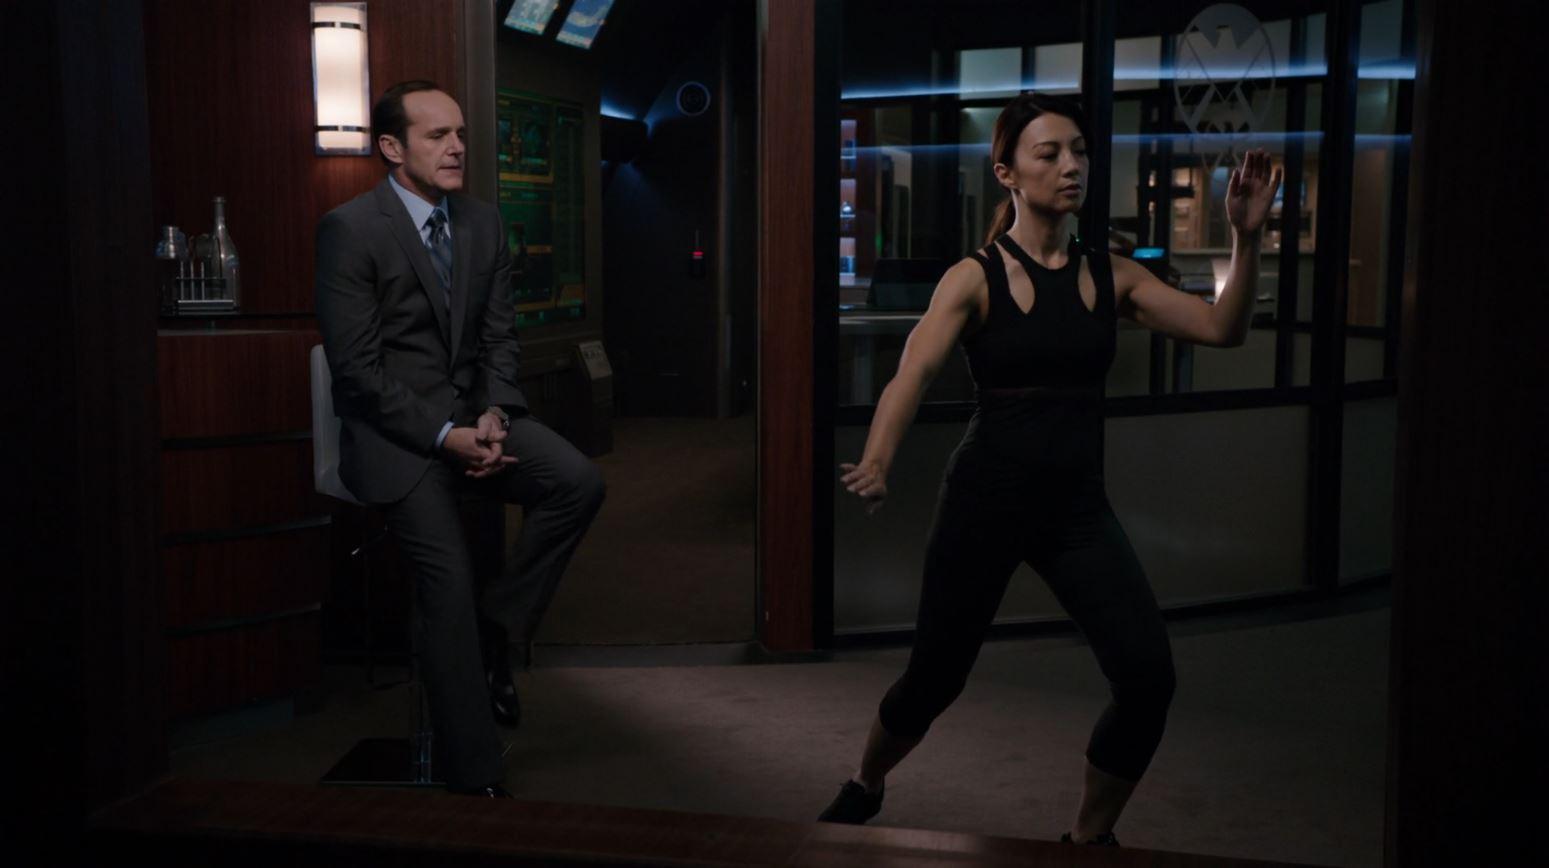 Melinda May (Ming na Wen) exercising with Coulson watching - Agents of SHIELD